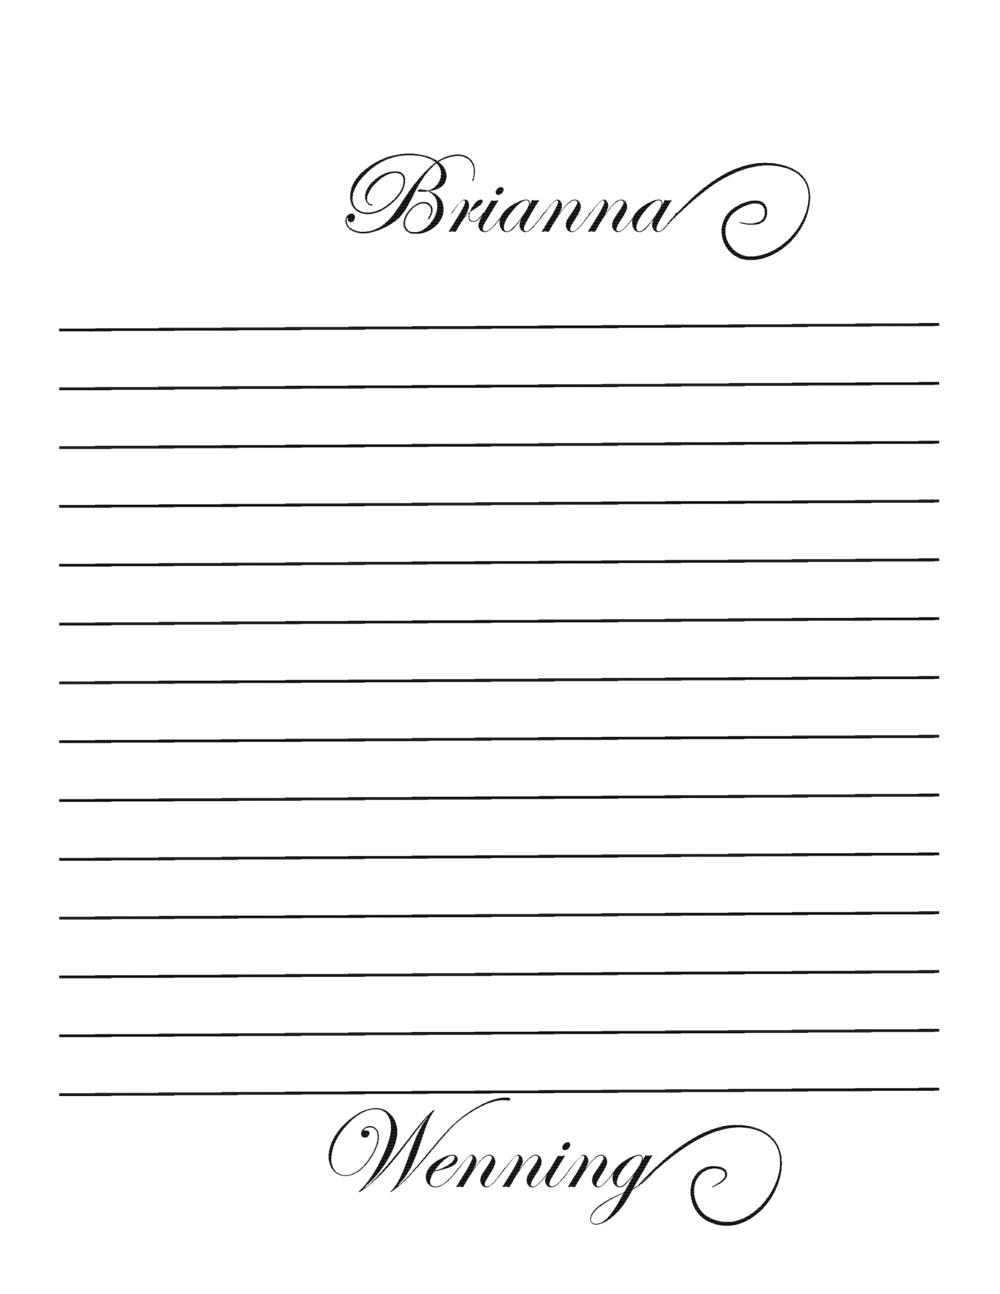 Wenning-notepad-4.png